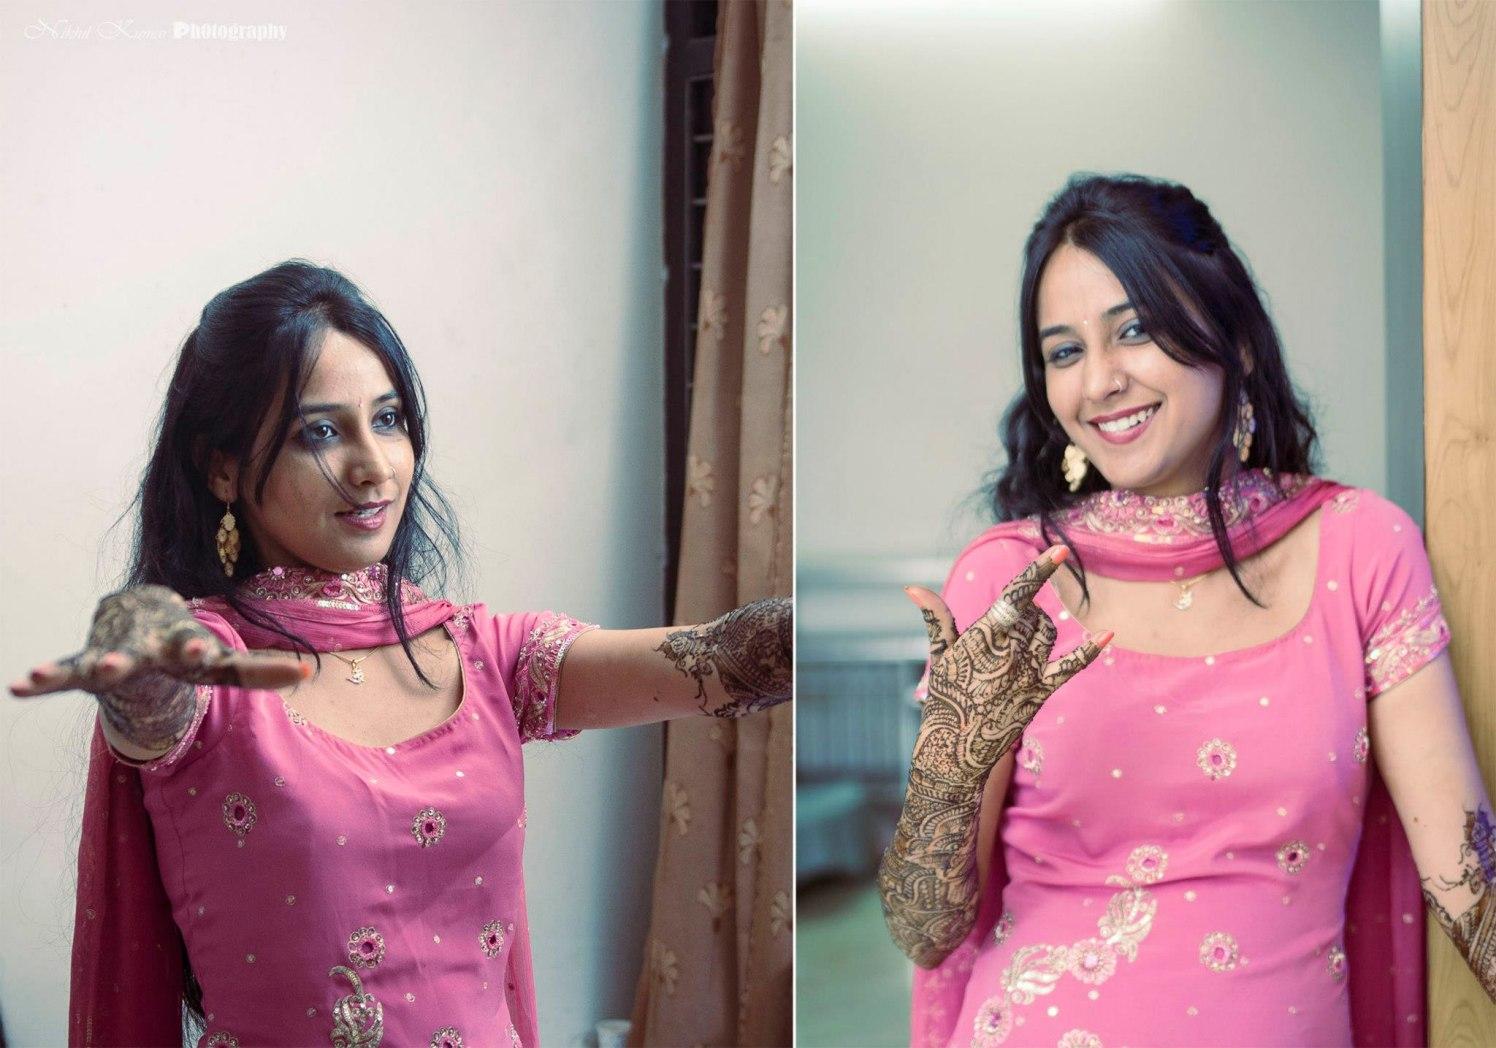 Henna Adorned Hands by Nikhil Kumar Bridal-mehendi   Weddings Photos & Ideas